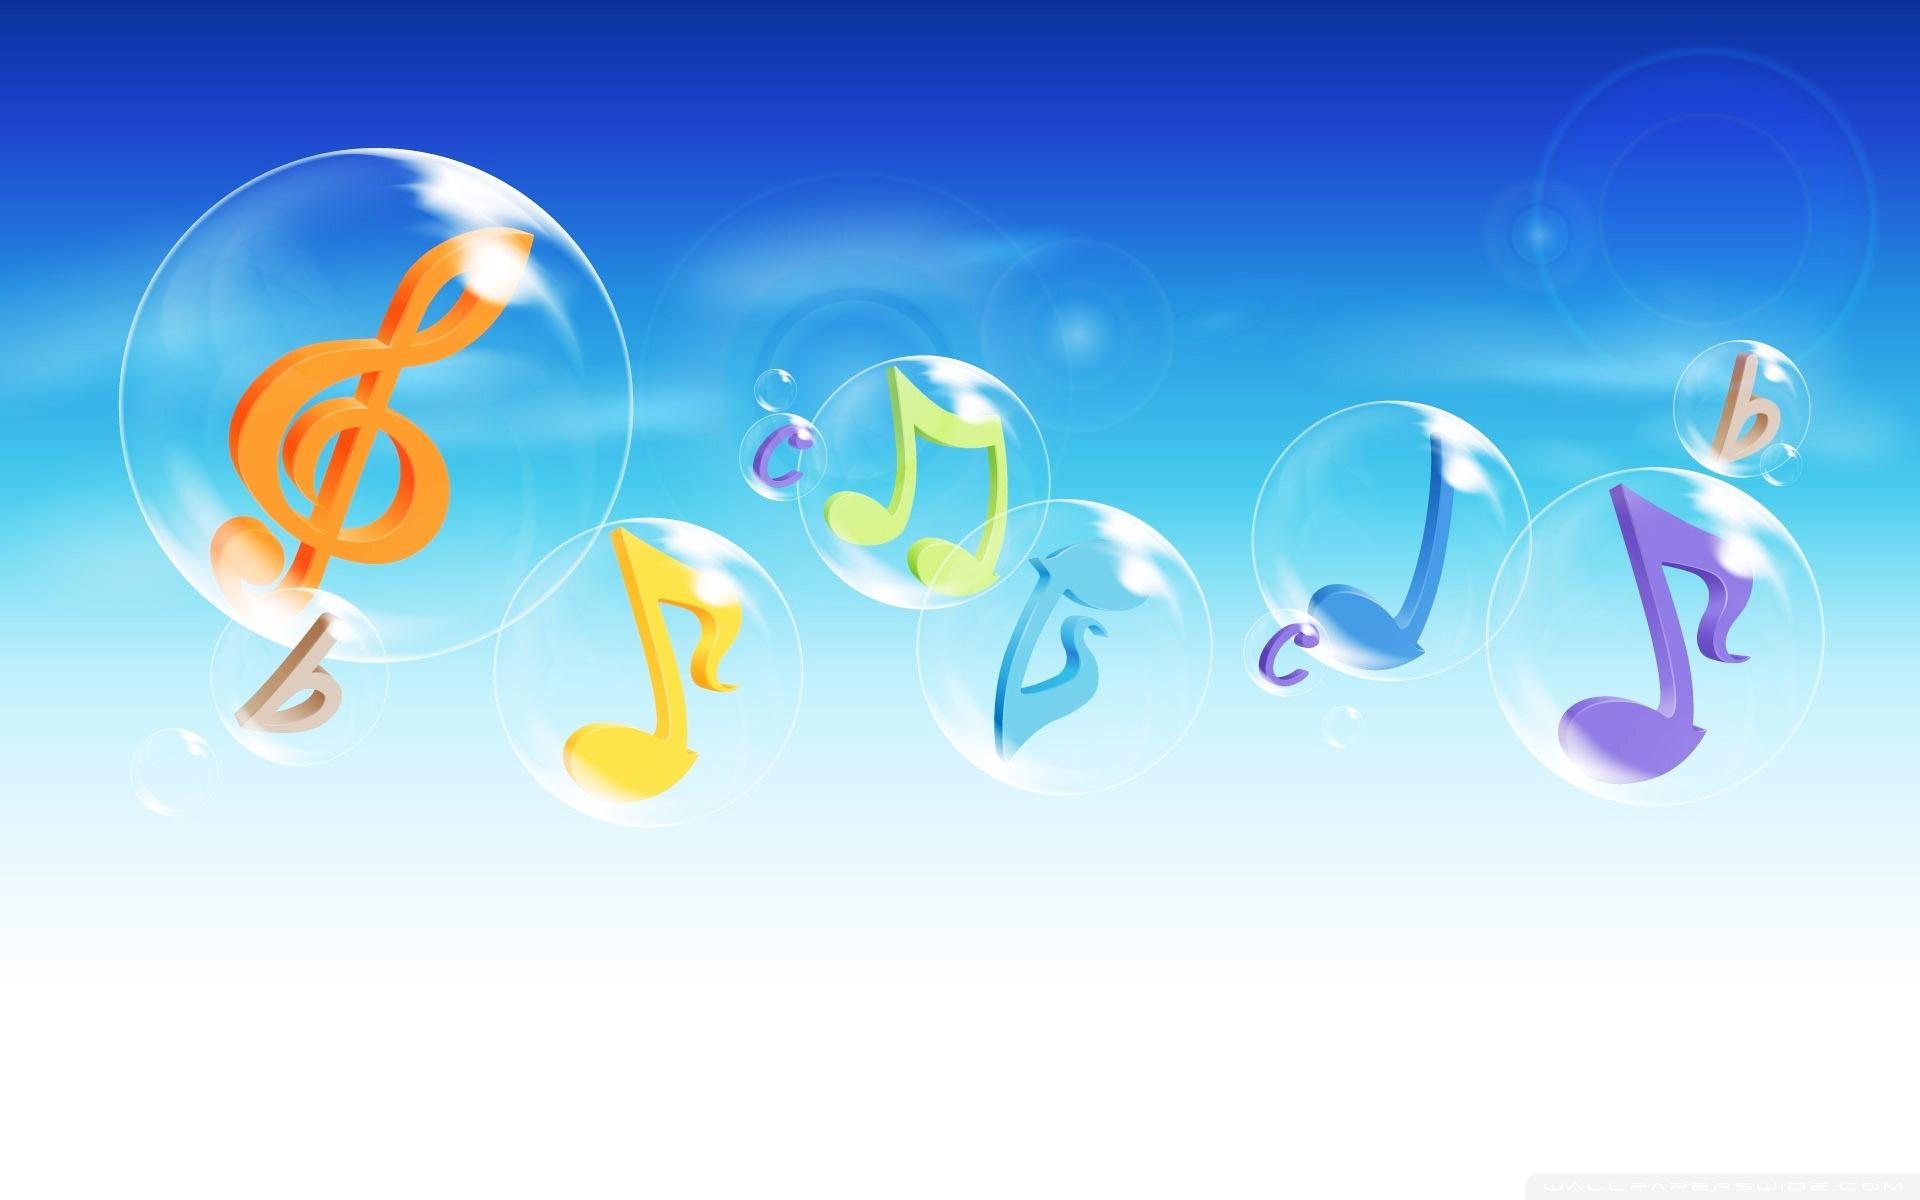 Scaricare Musica Su Iphone 7 Gratis